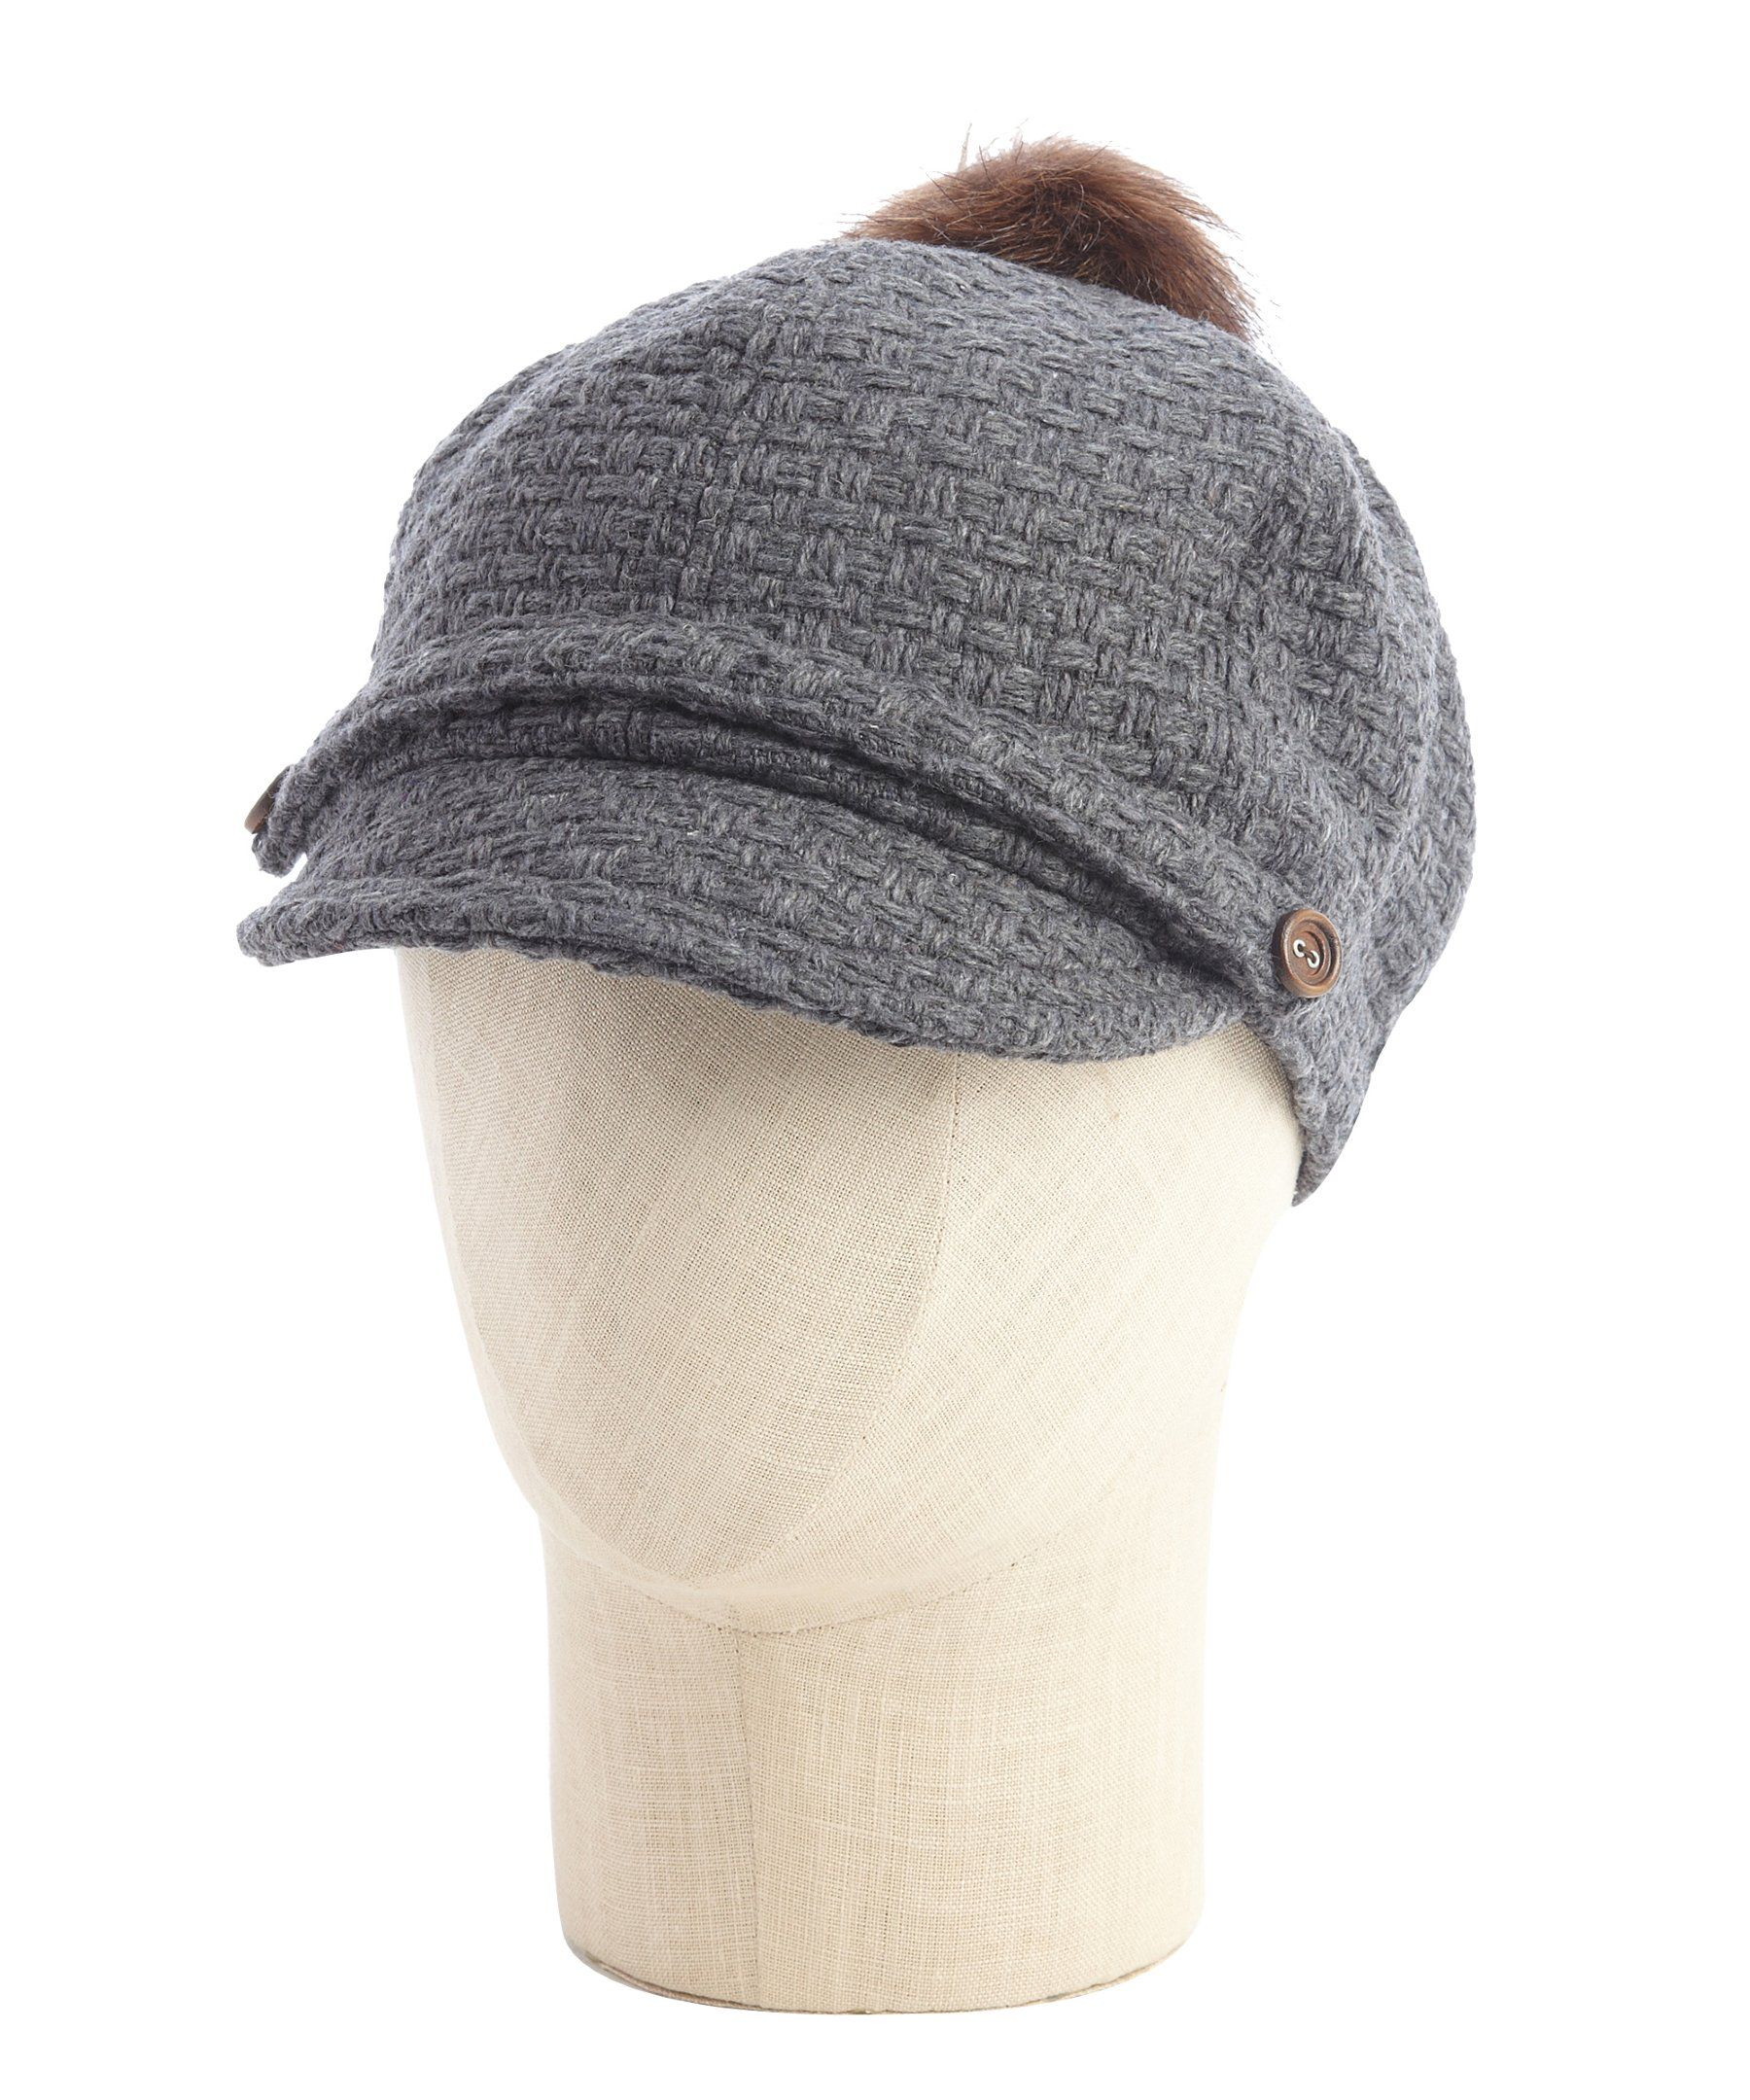 Designer Pom Pom Hats - Parchment N Lead 05b59e62f1d5